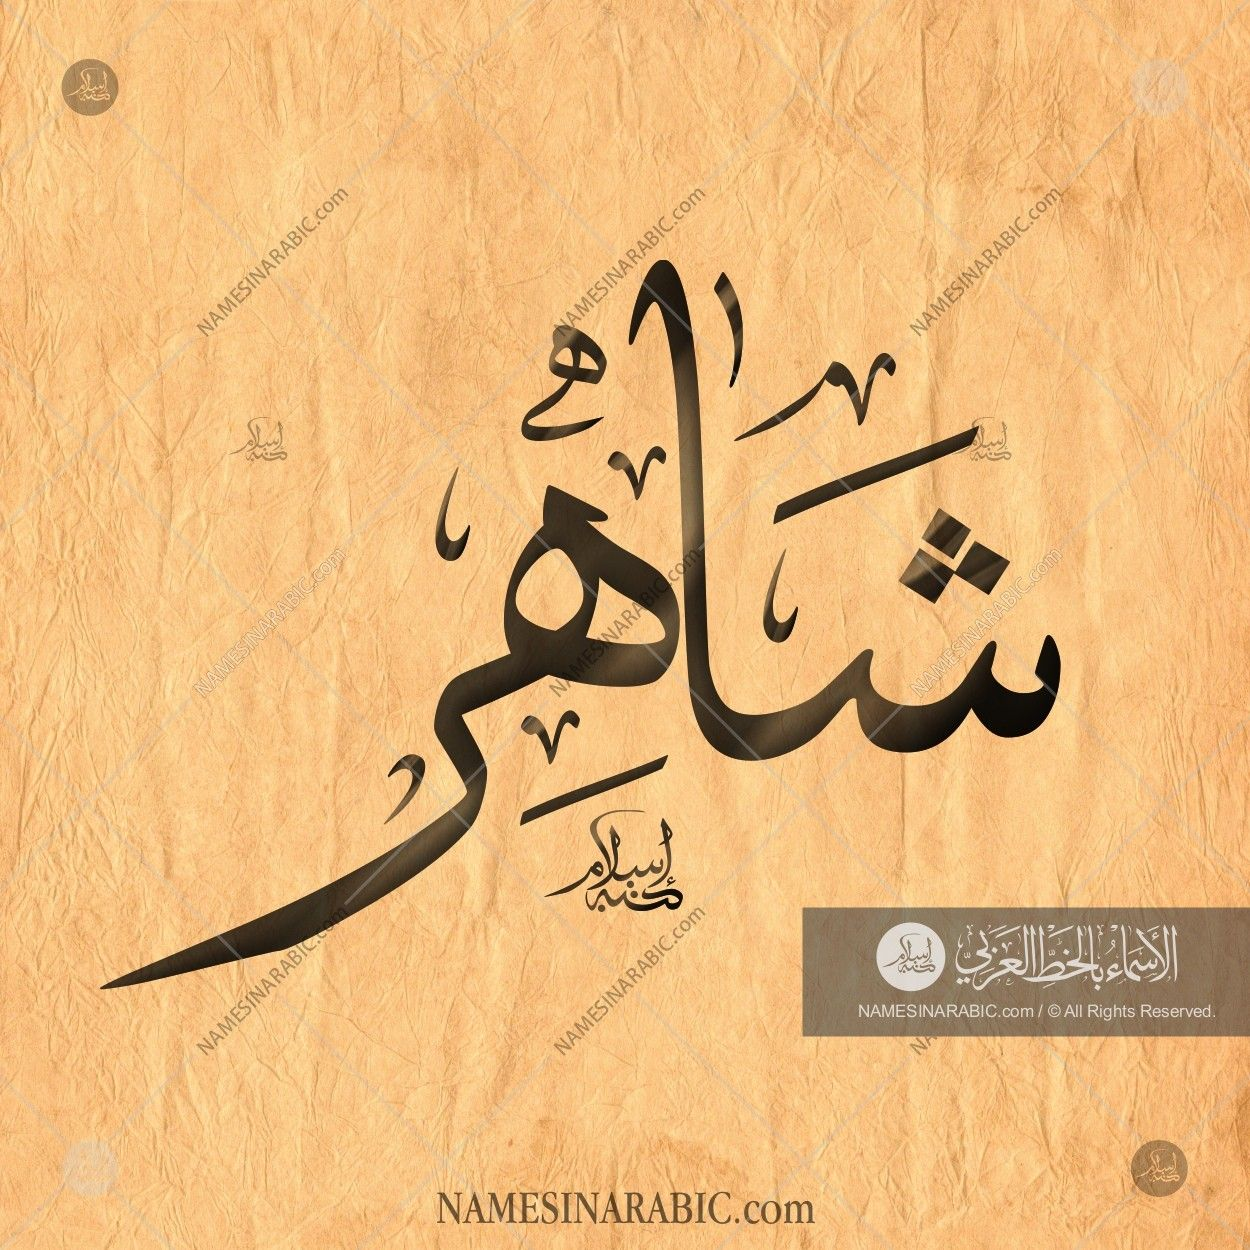 Shahir شاهر Names In Arabic Calligraphy Name 1693 Calligraphy Name Calligraphy Islamic Calligraphy